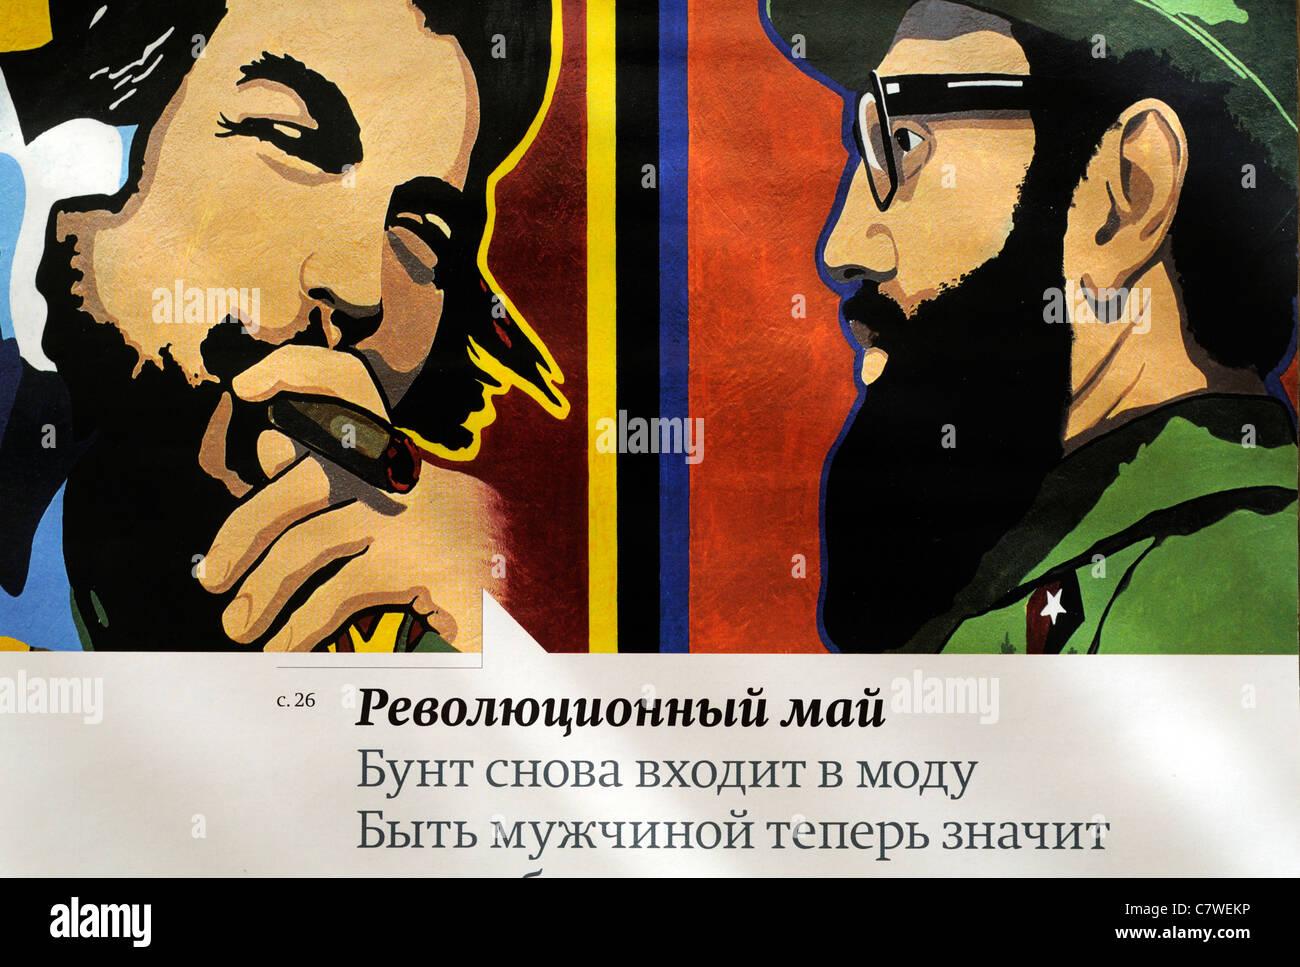 che guevara fidel castro cartoon illustration from a moscow magazine russia communist communism hero cuba icon iconic - Stock Image